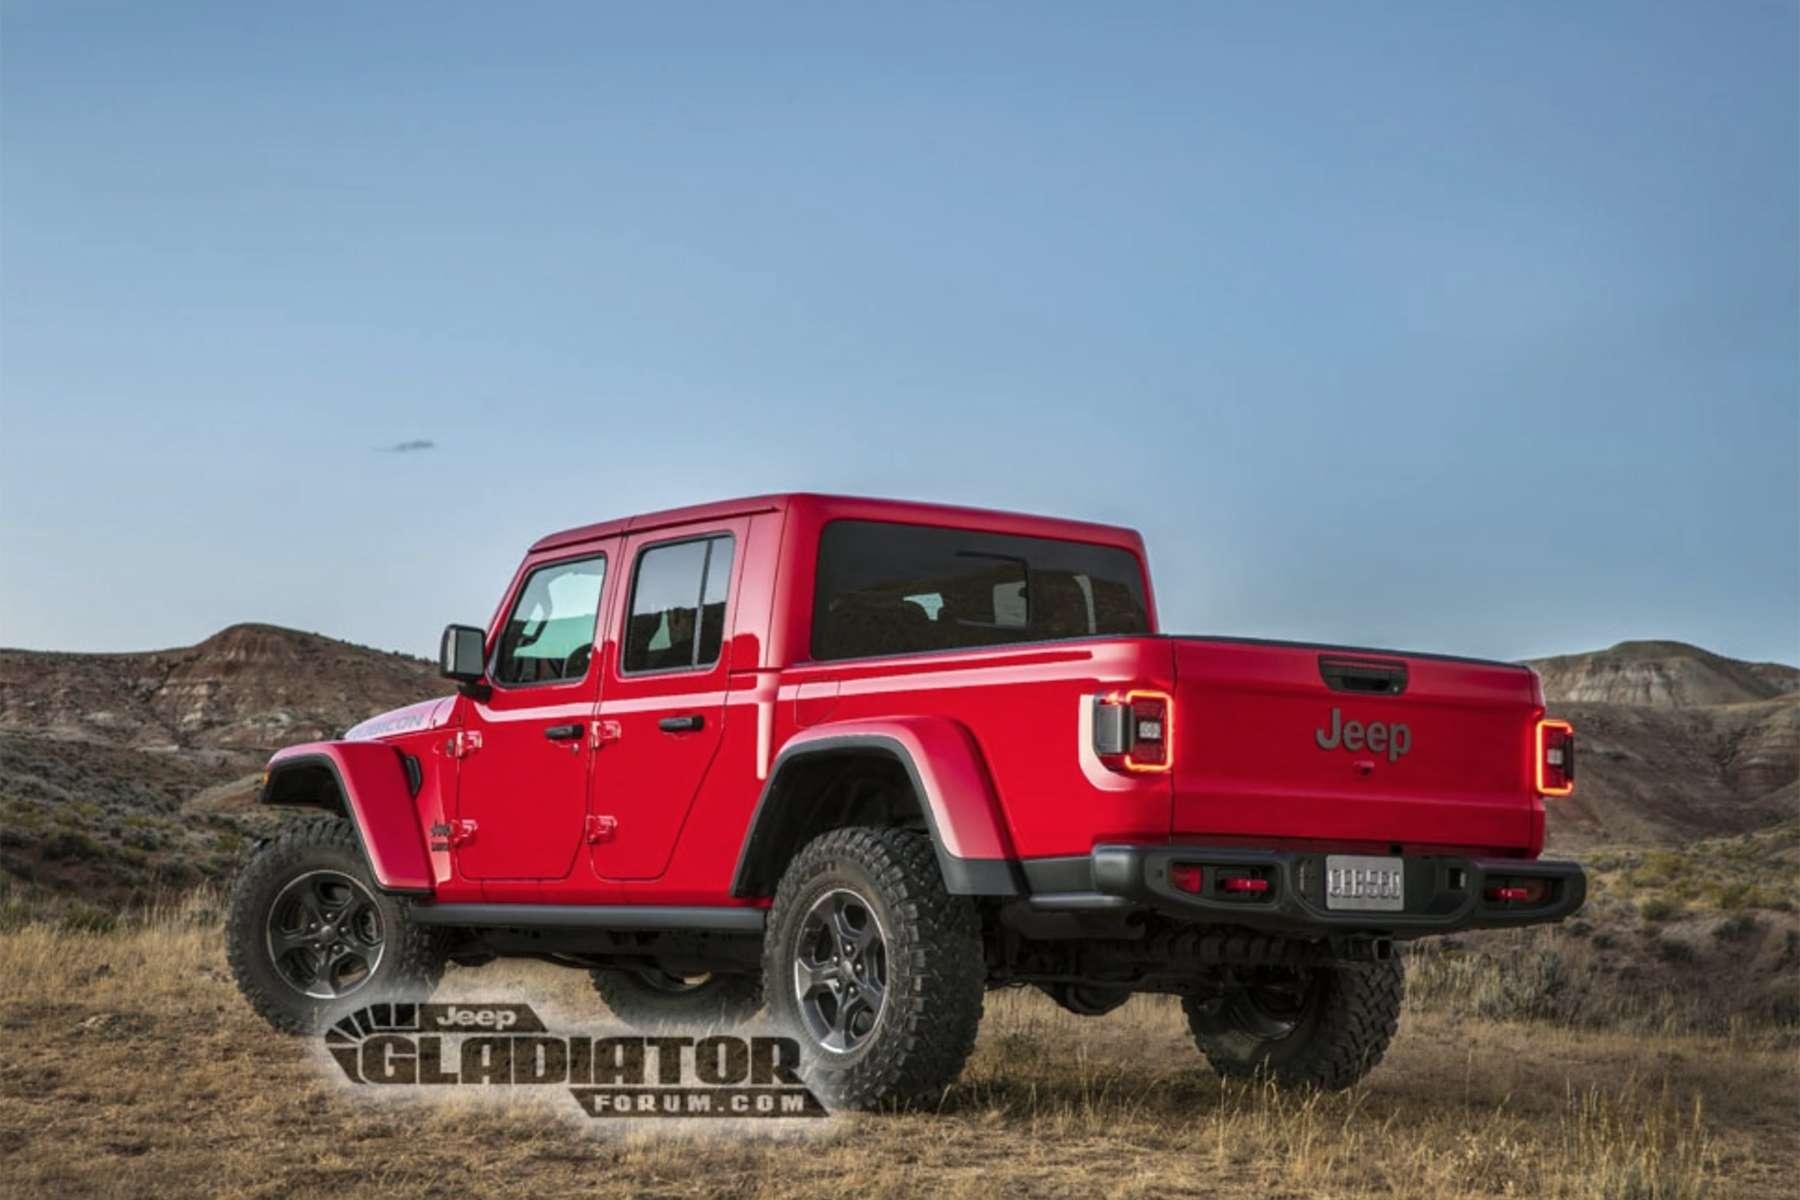 Pick up Jeep Gladiator